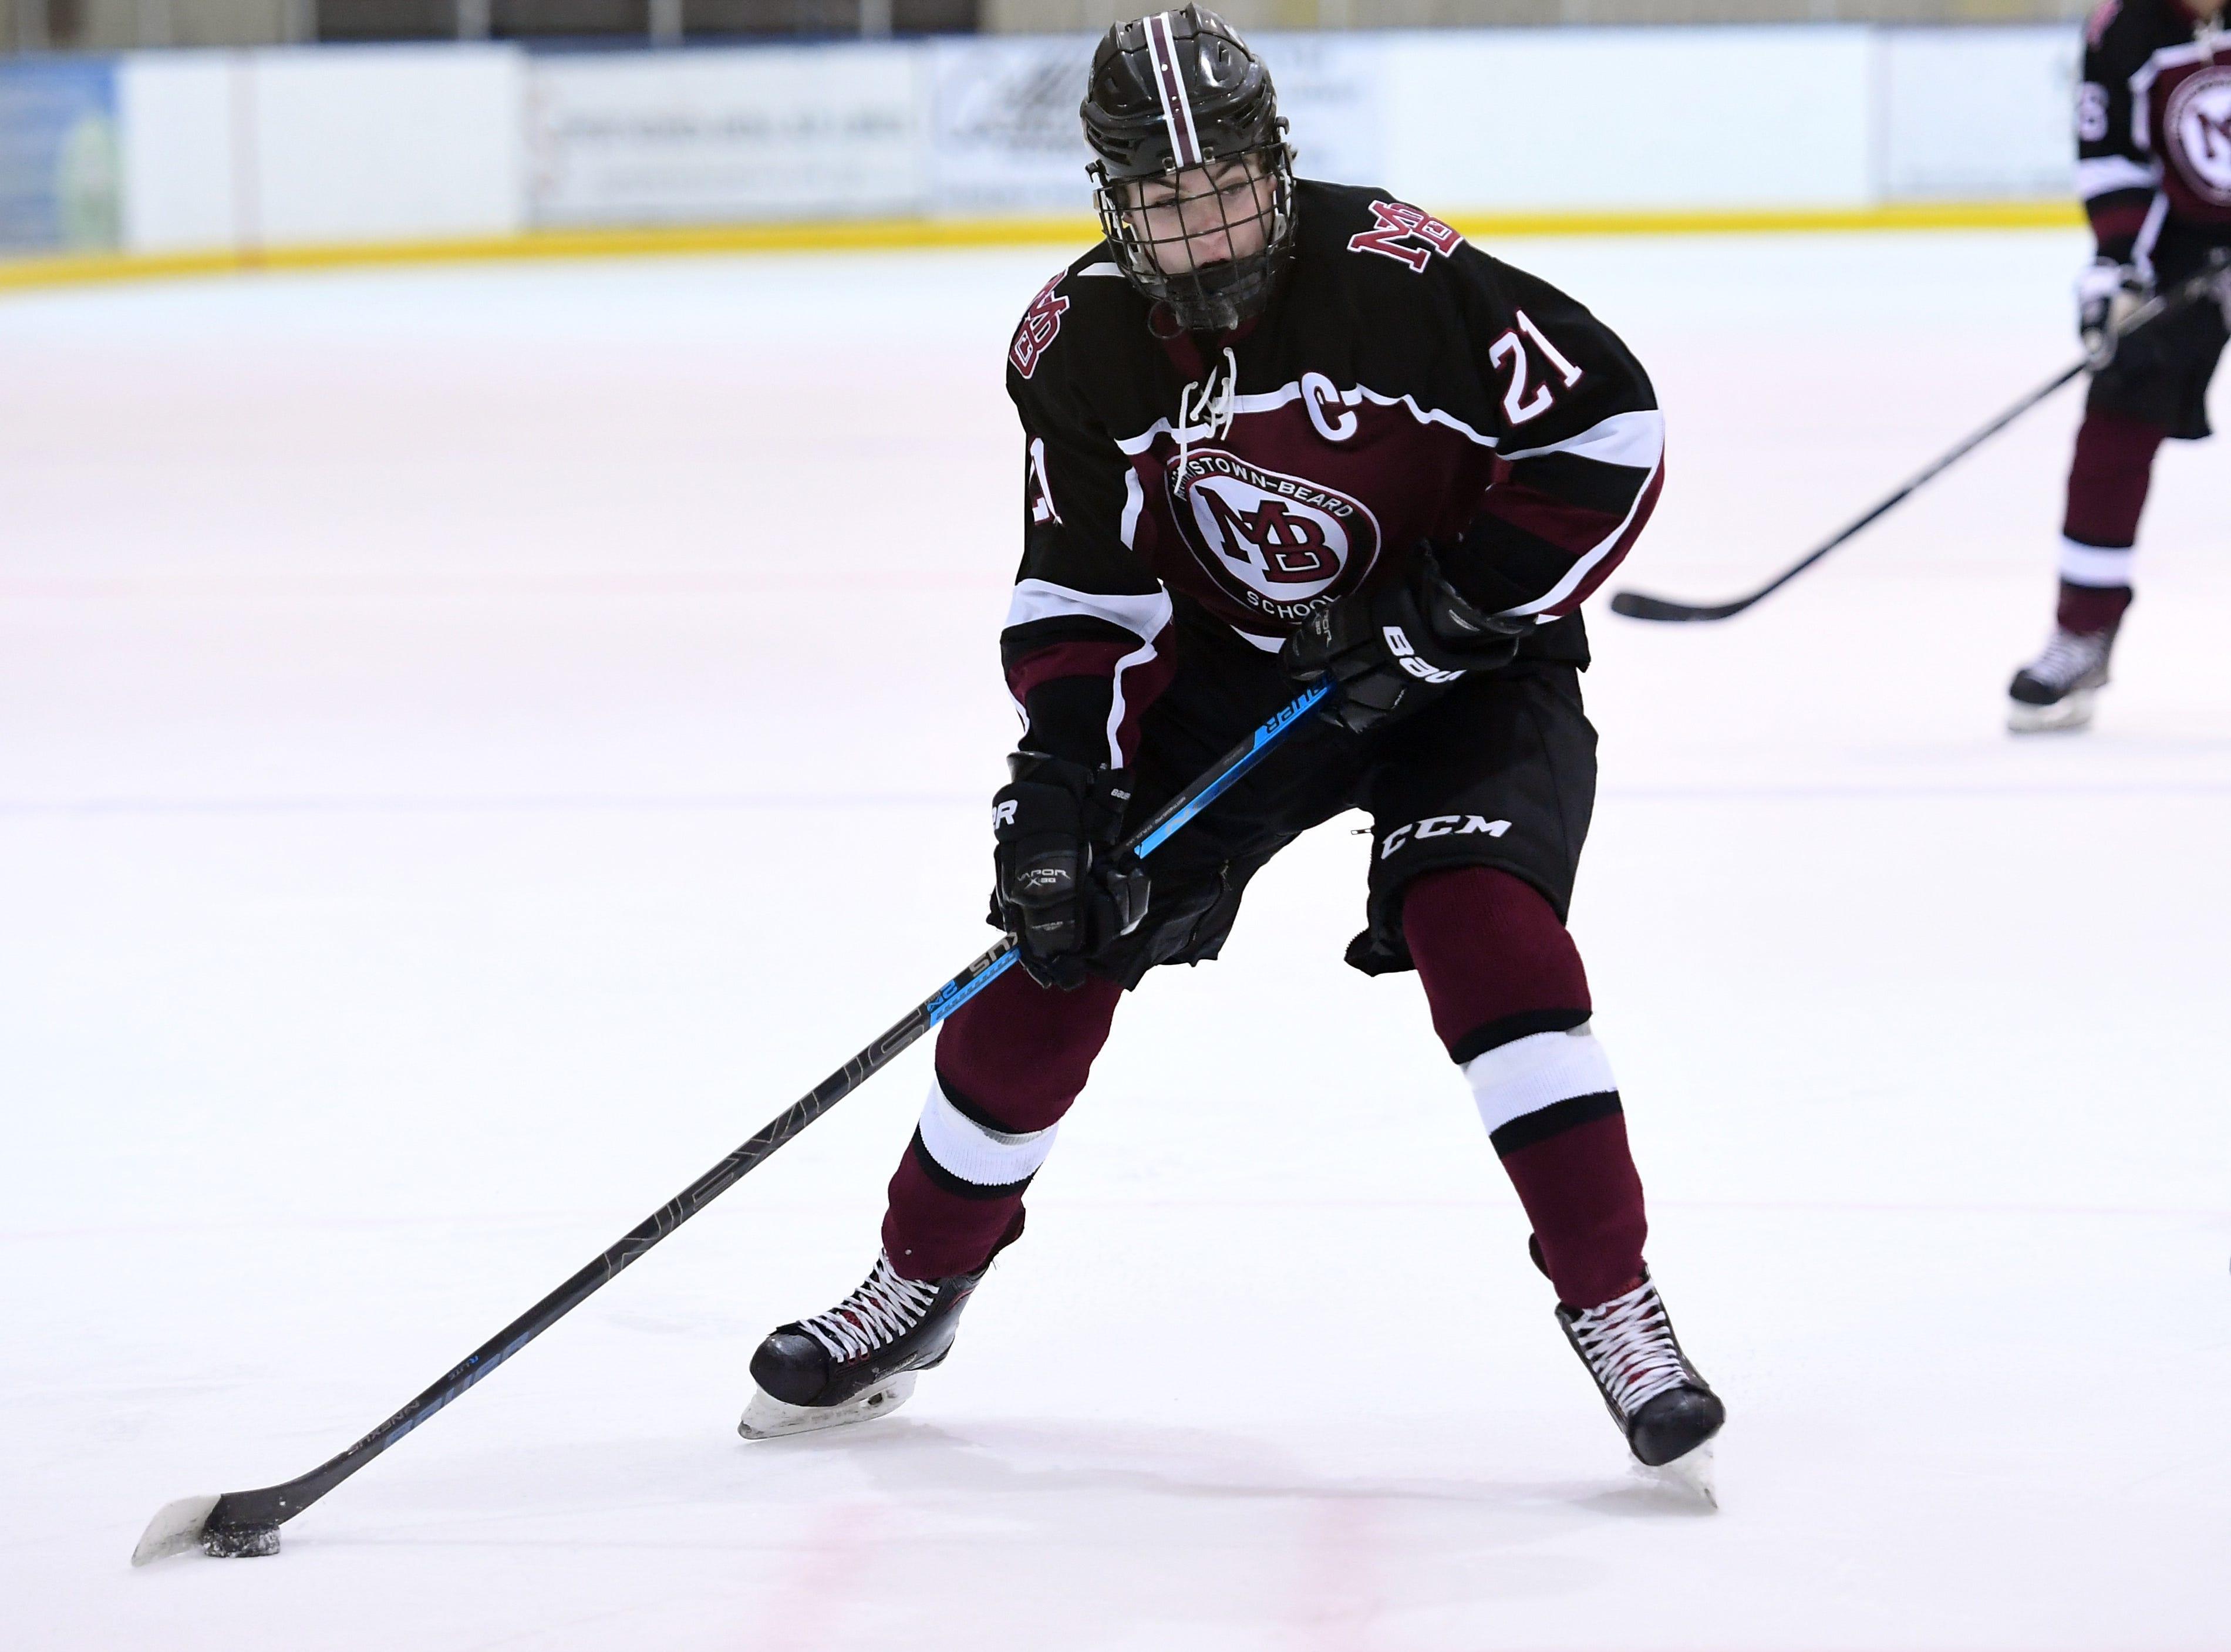 Madison ice hockey vs. Morristown-Beard at Mennen Sports Arena on Thursday, December 20, 2018.  Morristown-Beard #21 Connor Tartaglione.